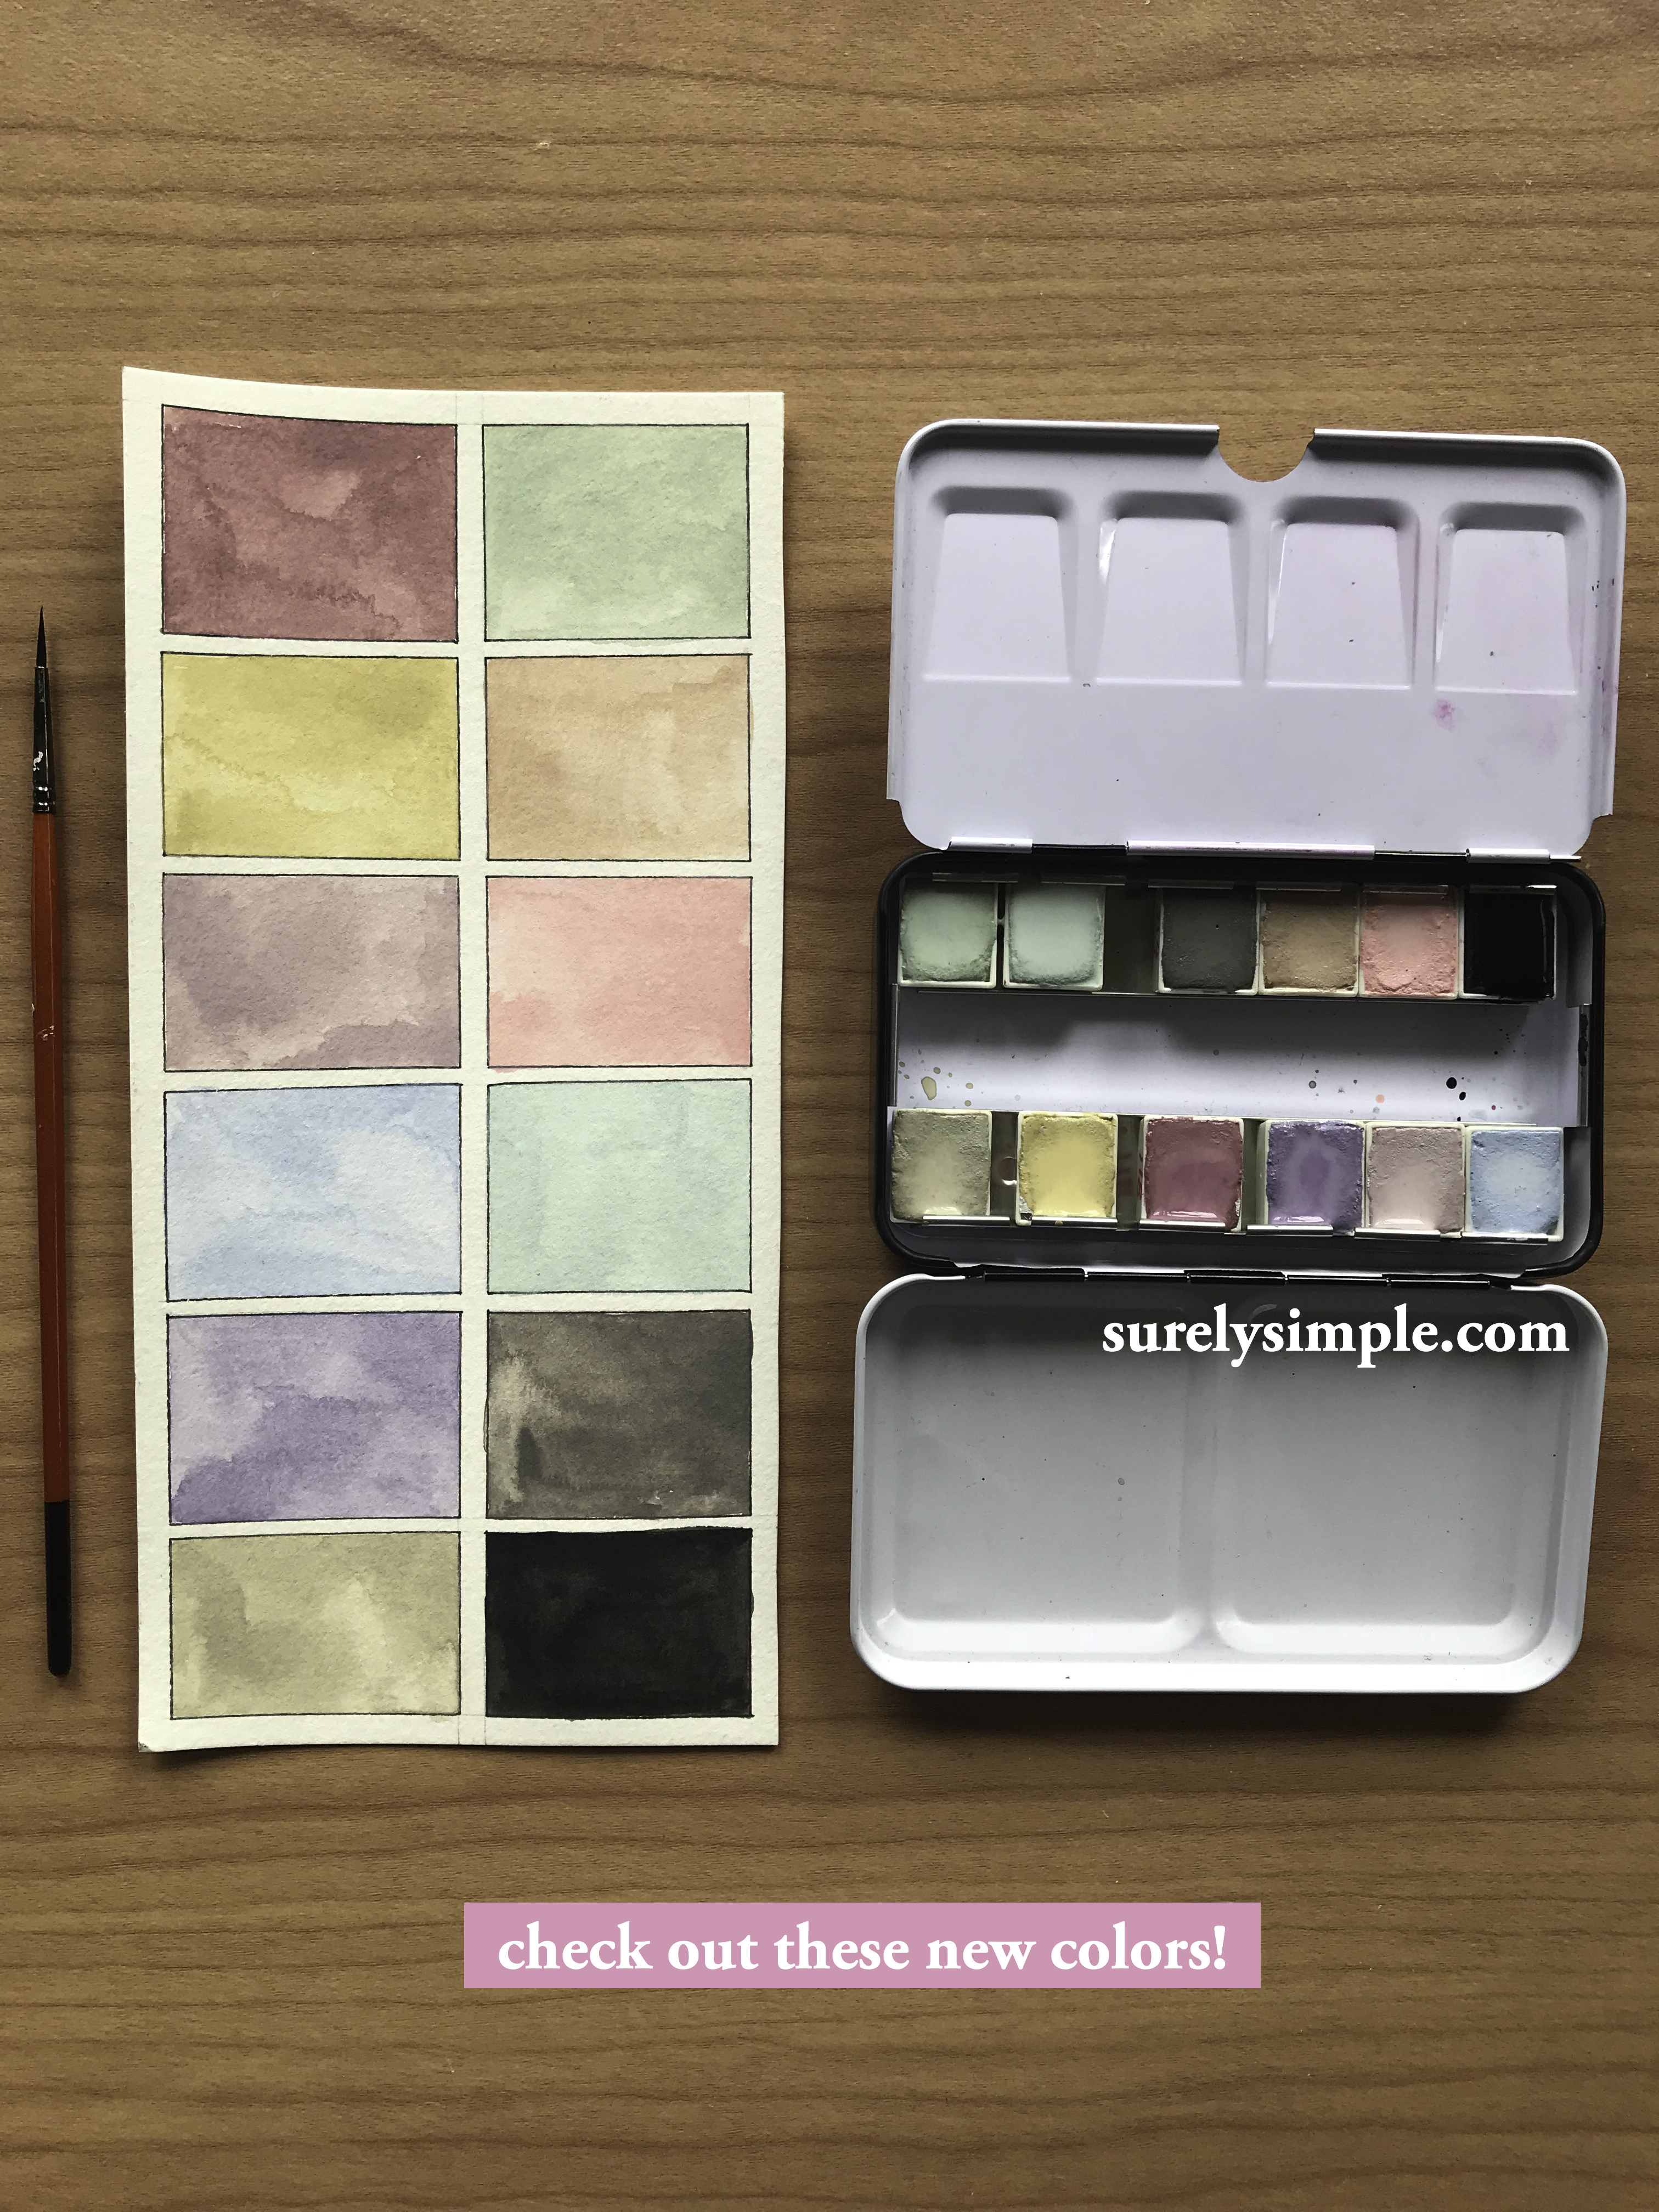 Watercolor Review: Prima Marketing Inc Vintage Pastel! (New Release!) - via surelysimple.com // IG: instagram.com/surelysimpleblog